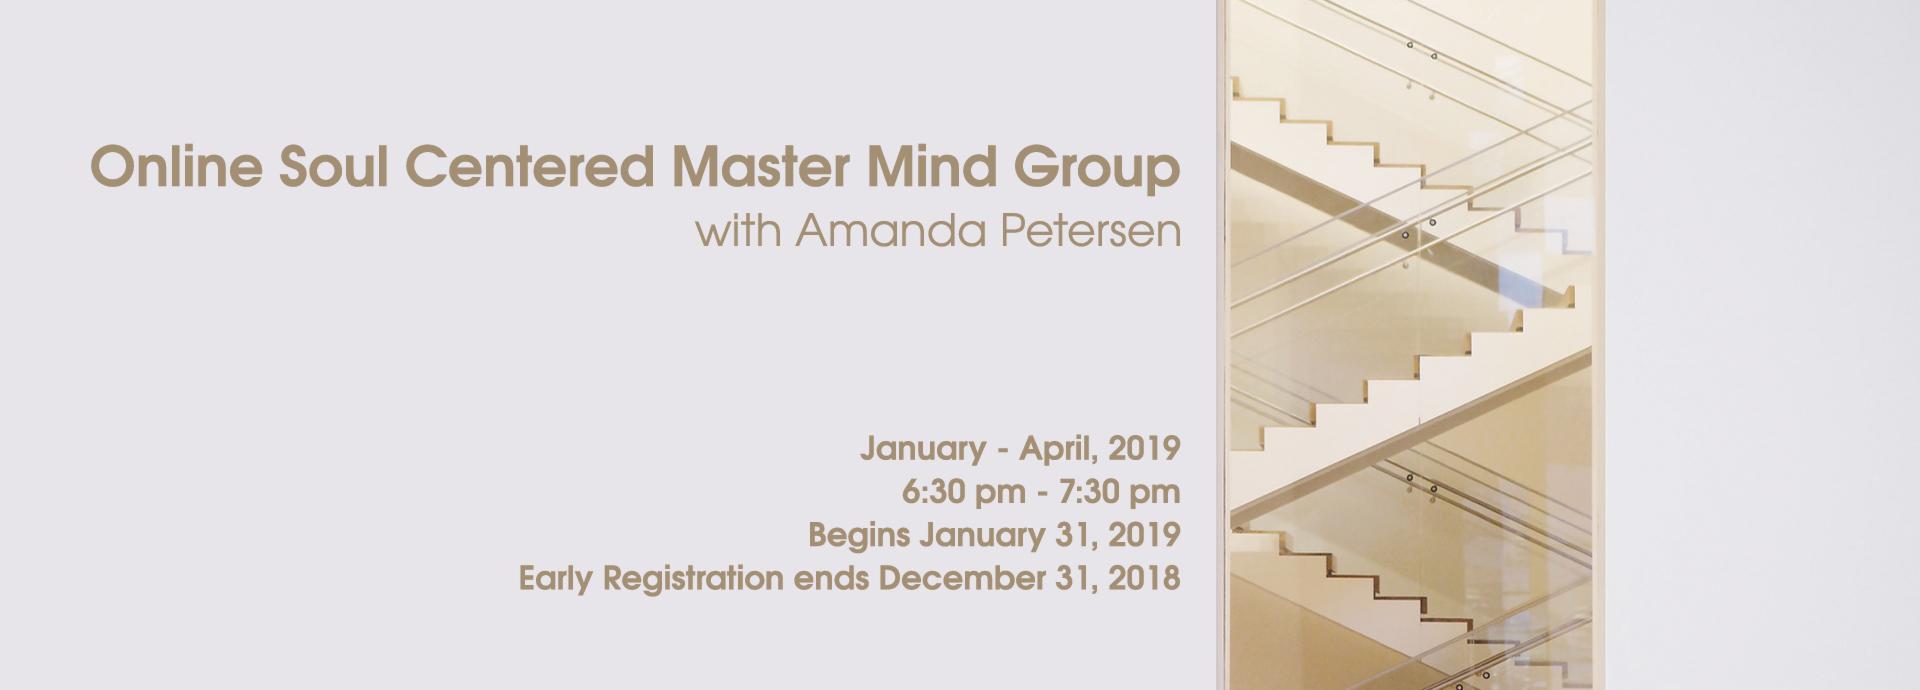 PoG_Wellness_Amanda---Soul-Centered-Master-Mind-Group.jpg